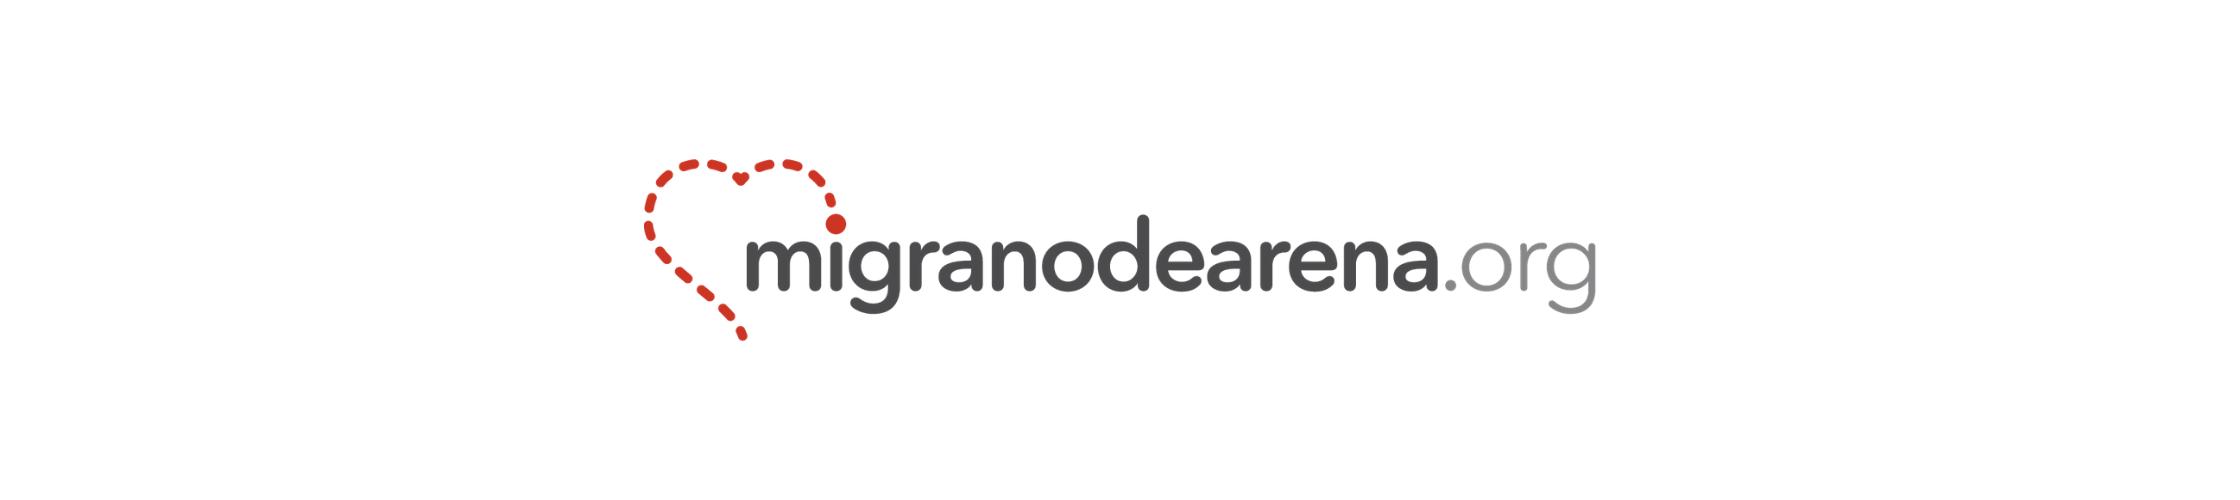 migranodearena blog